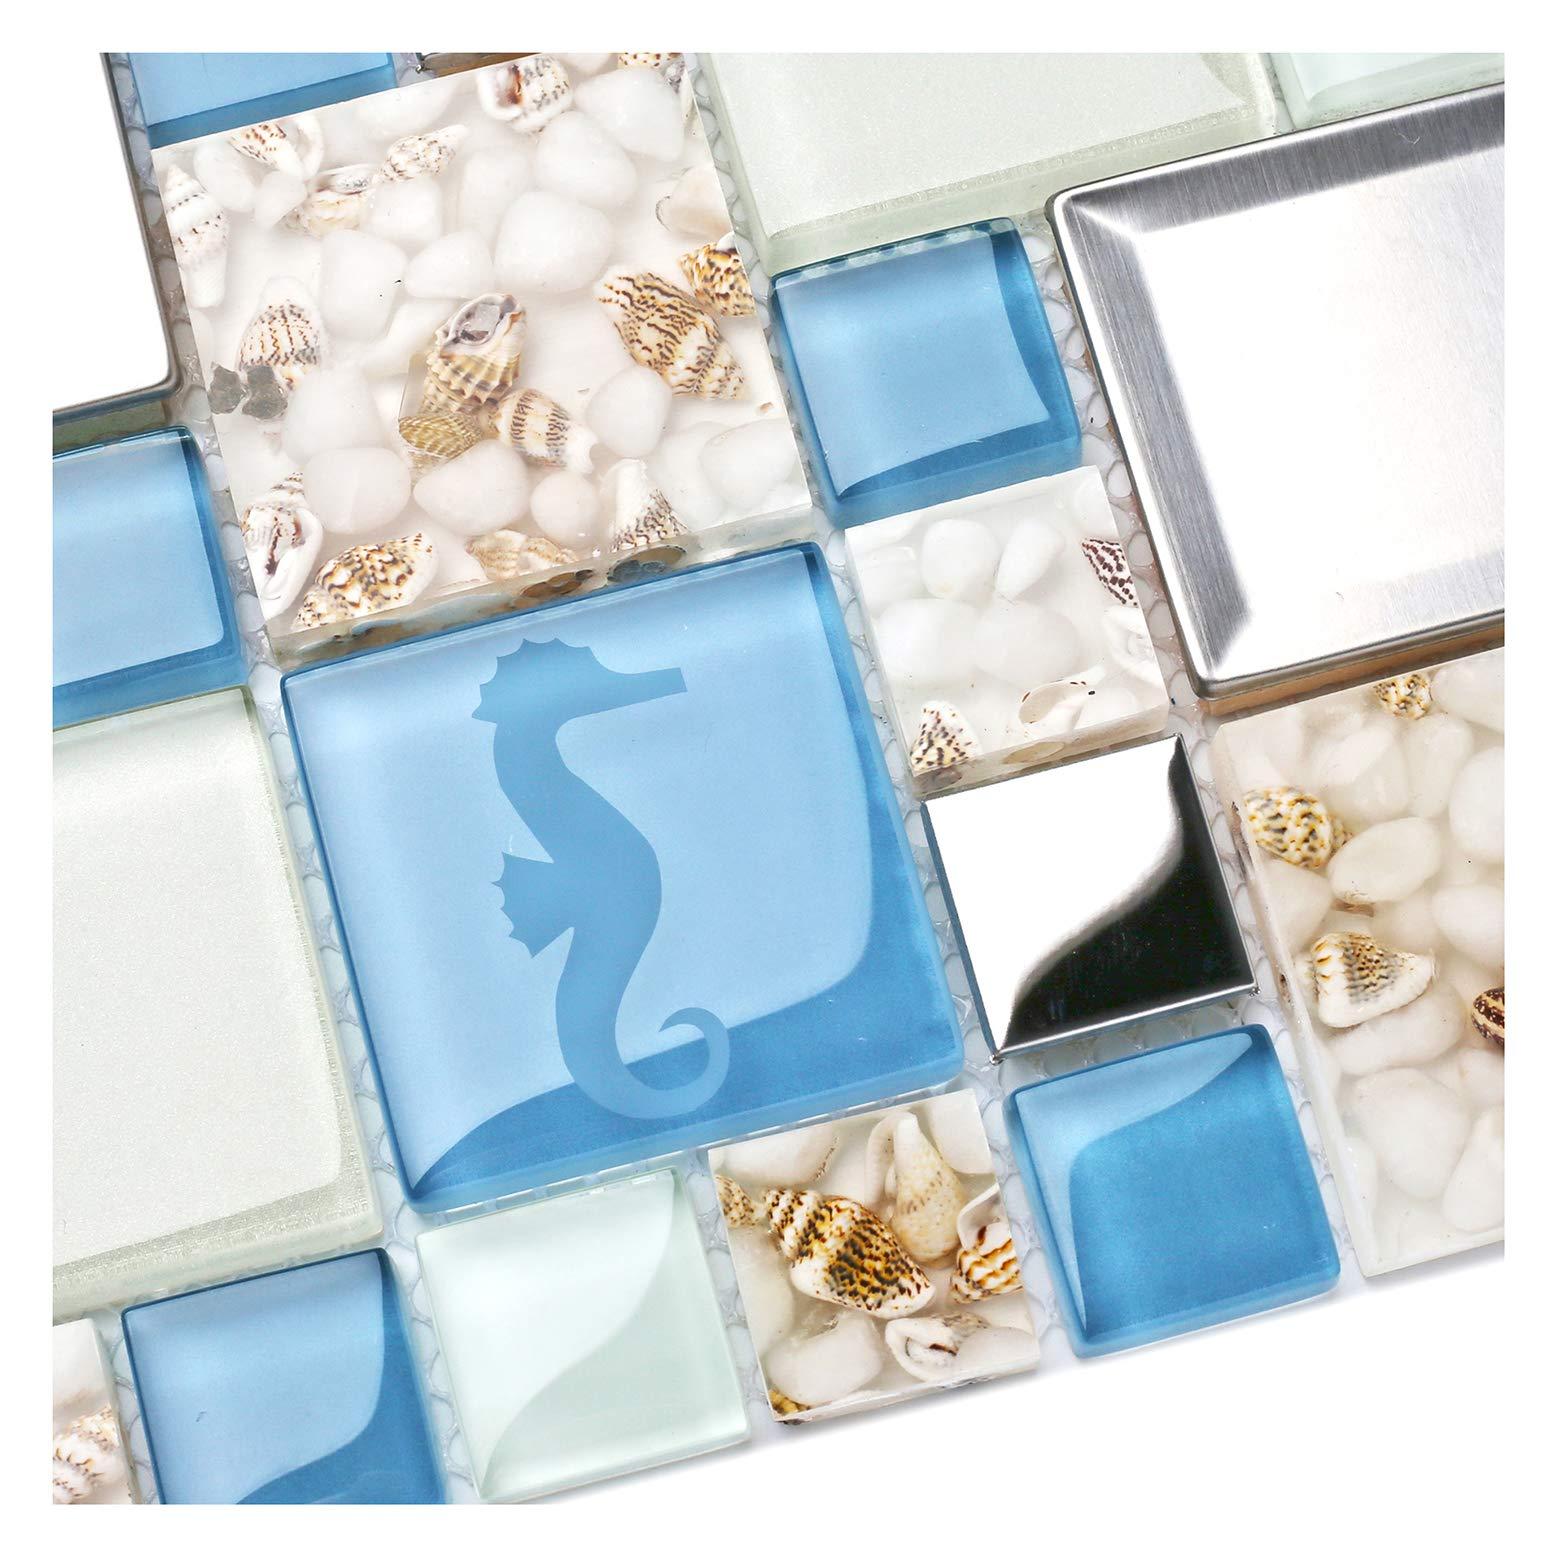 New Idea Tile Kitchen Bath Backsplash Accent Wall Decor TST Glass Metal Tile Marine Animals Icon Beach Style Inner Conch Sea Blue Mosaic Tiles TSTNB11 (5 Square Feet)